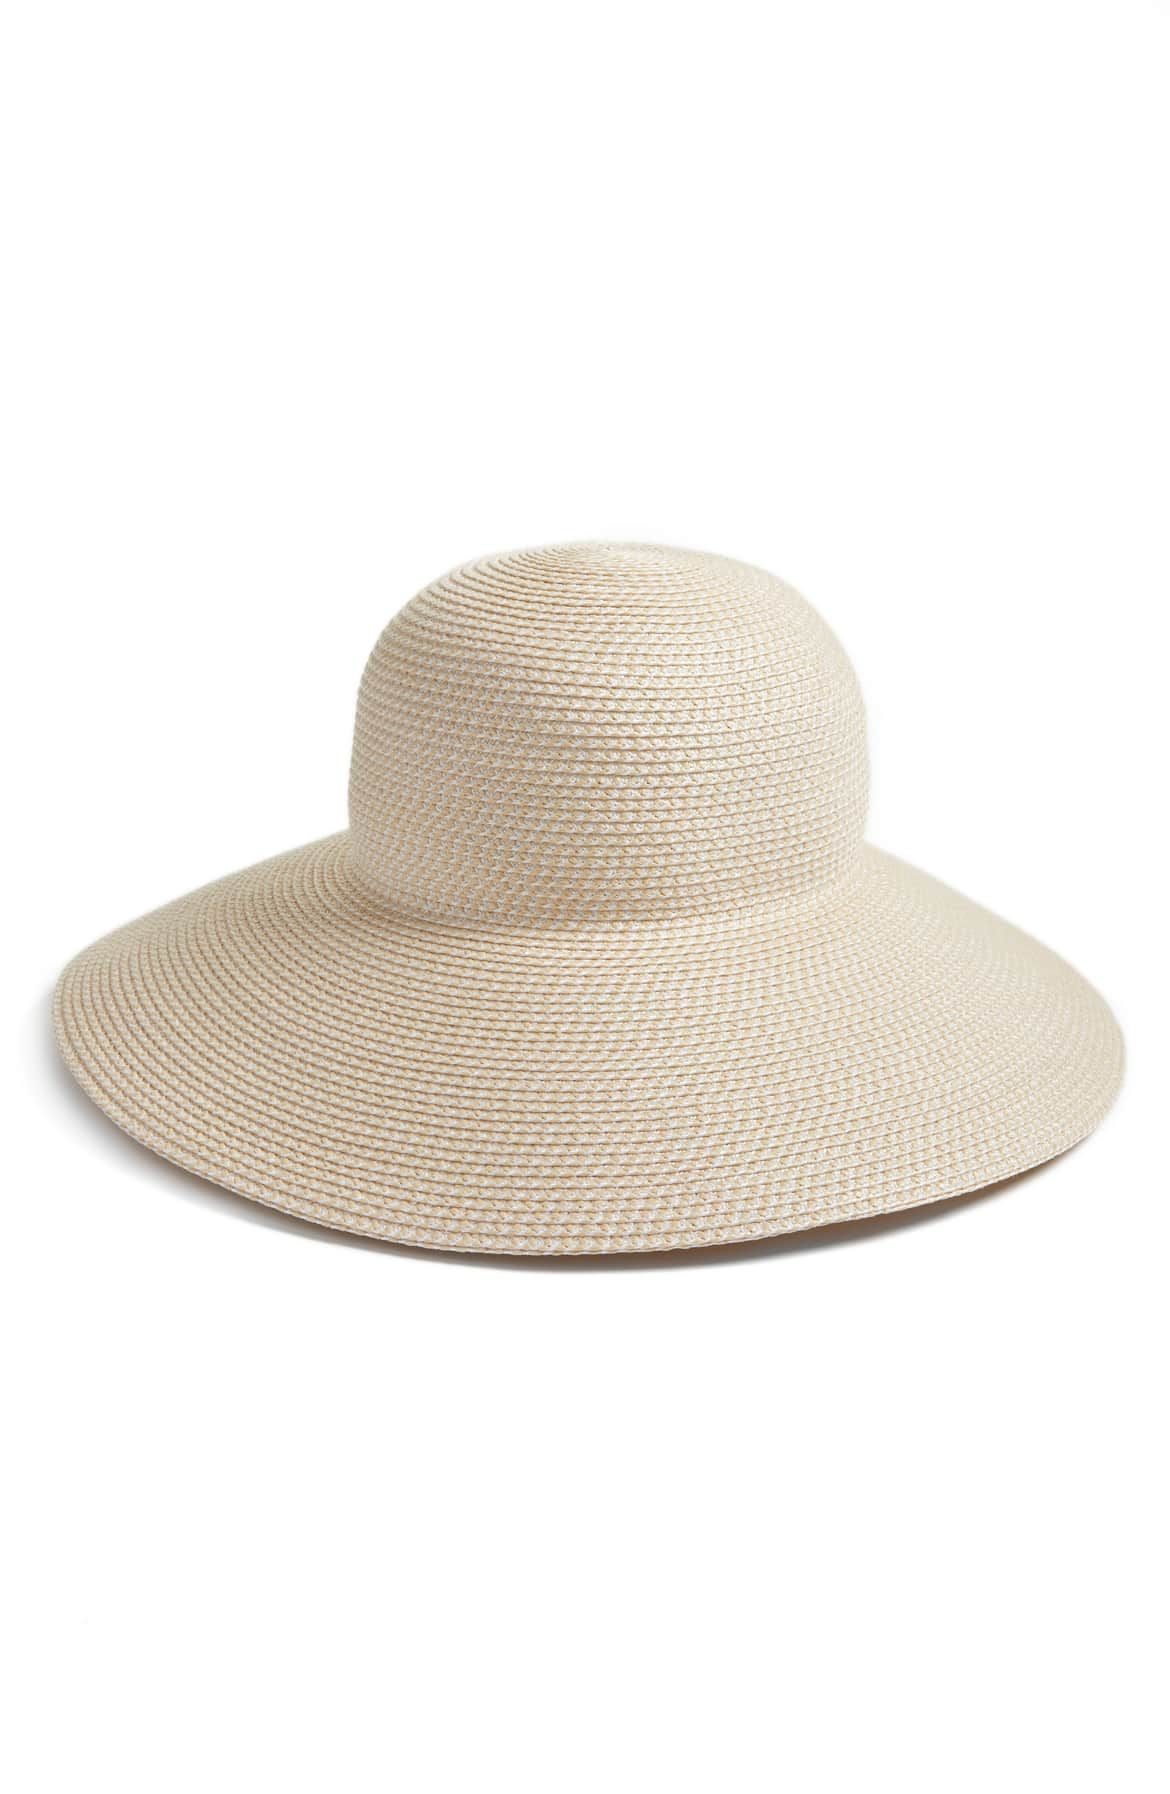 293c4efe3db892 Eric Javits 'Hampton' Straw Sun Hat | Nordstrom | My Style in 2019 ...